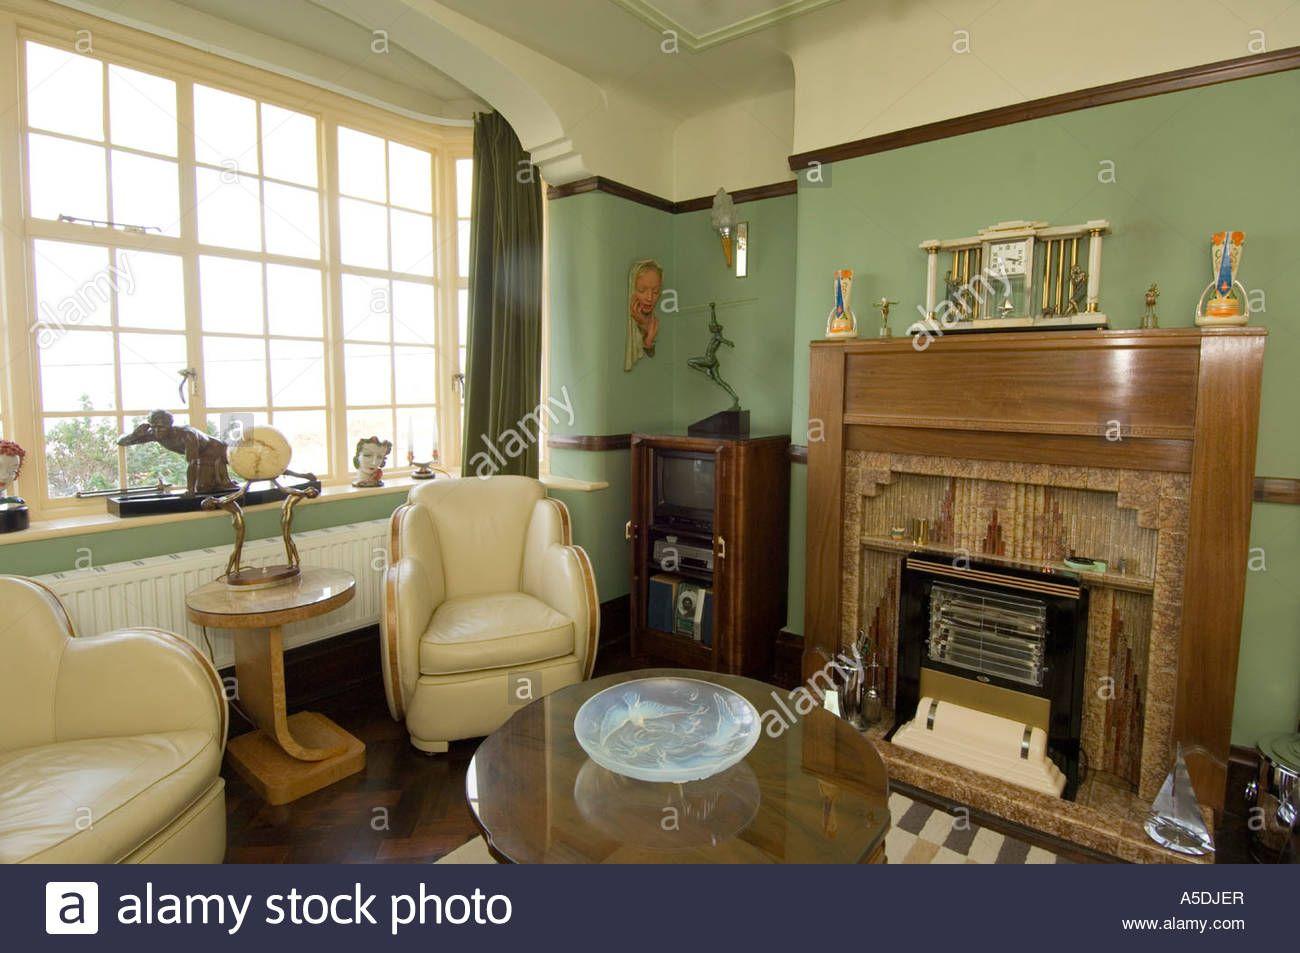 Download this stock image refurbished art deco 1930 s - Refurbished living room furniture ...